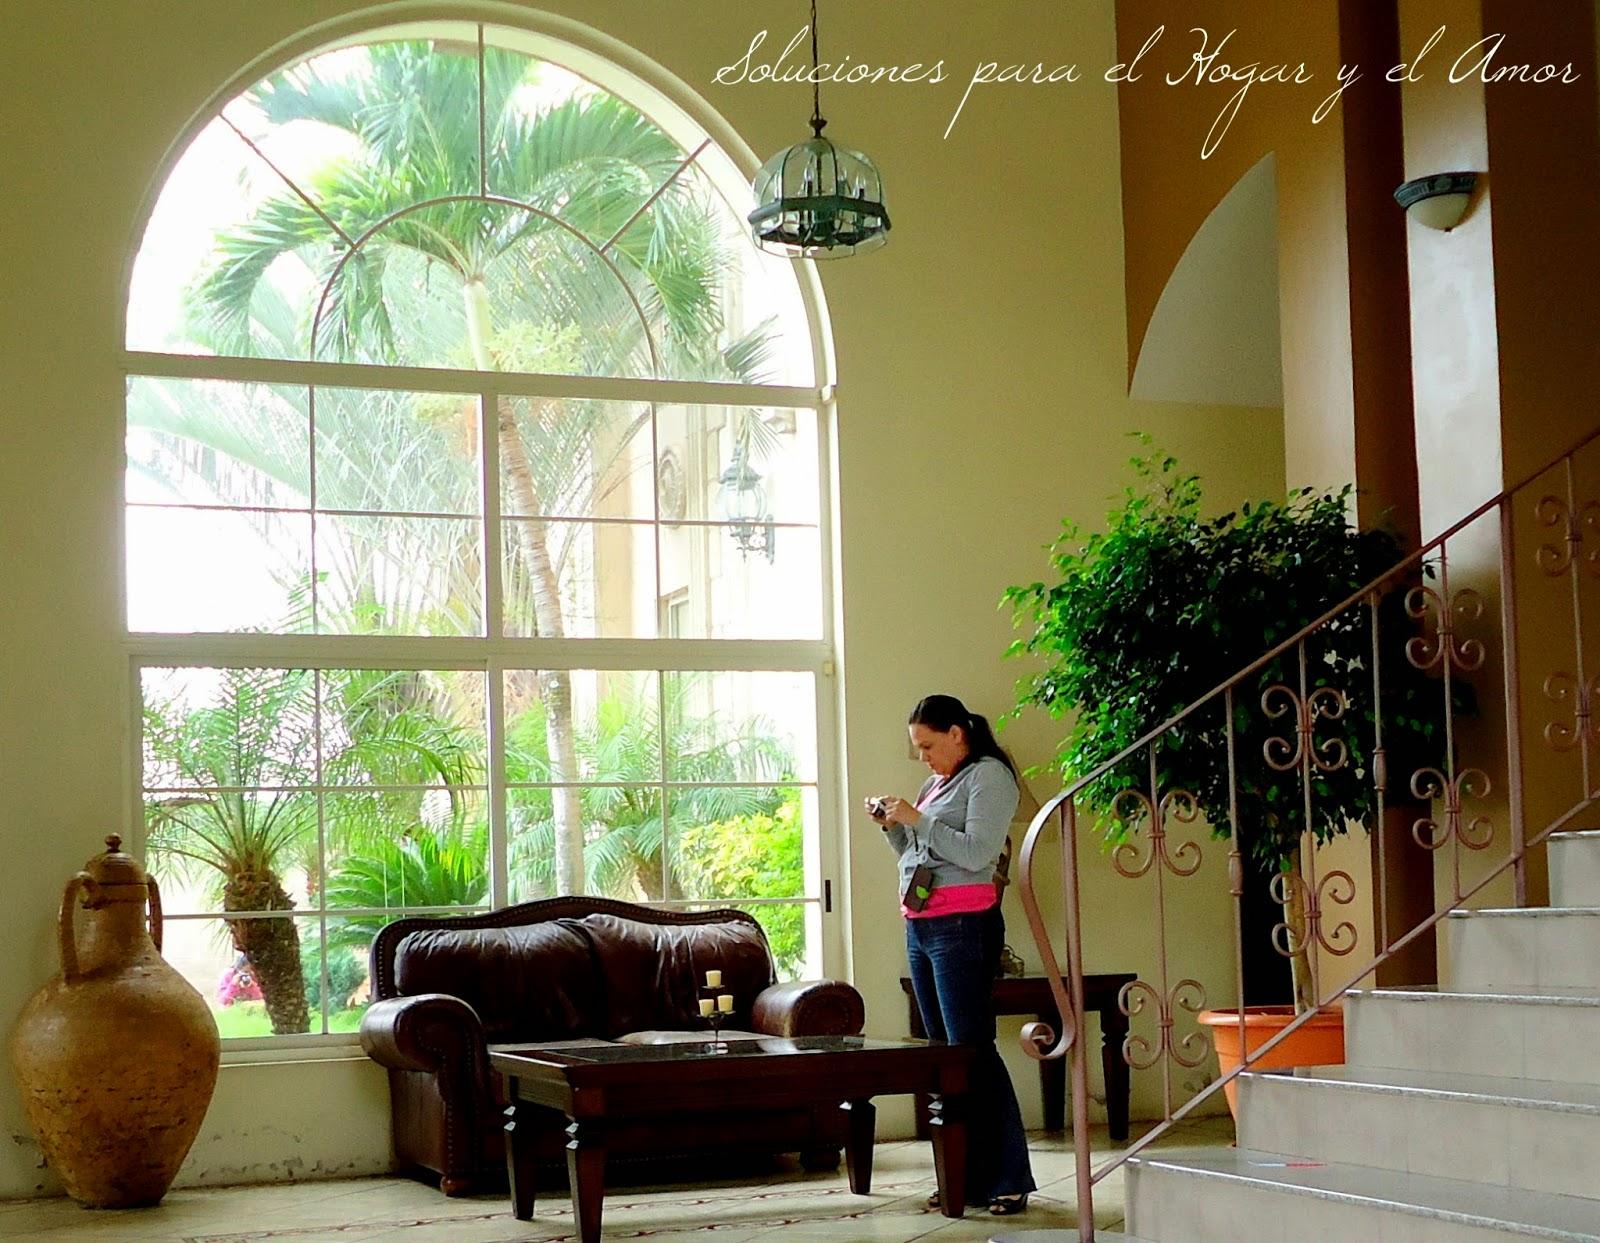 salon, sala, ventanal, sofá, mesa, escalera, jarrón, planta